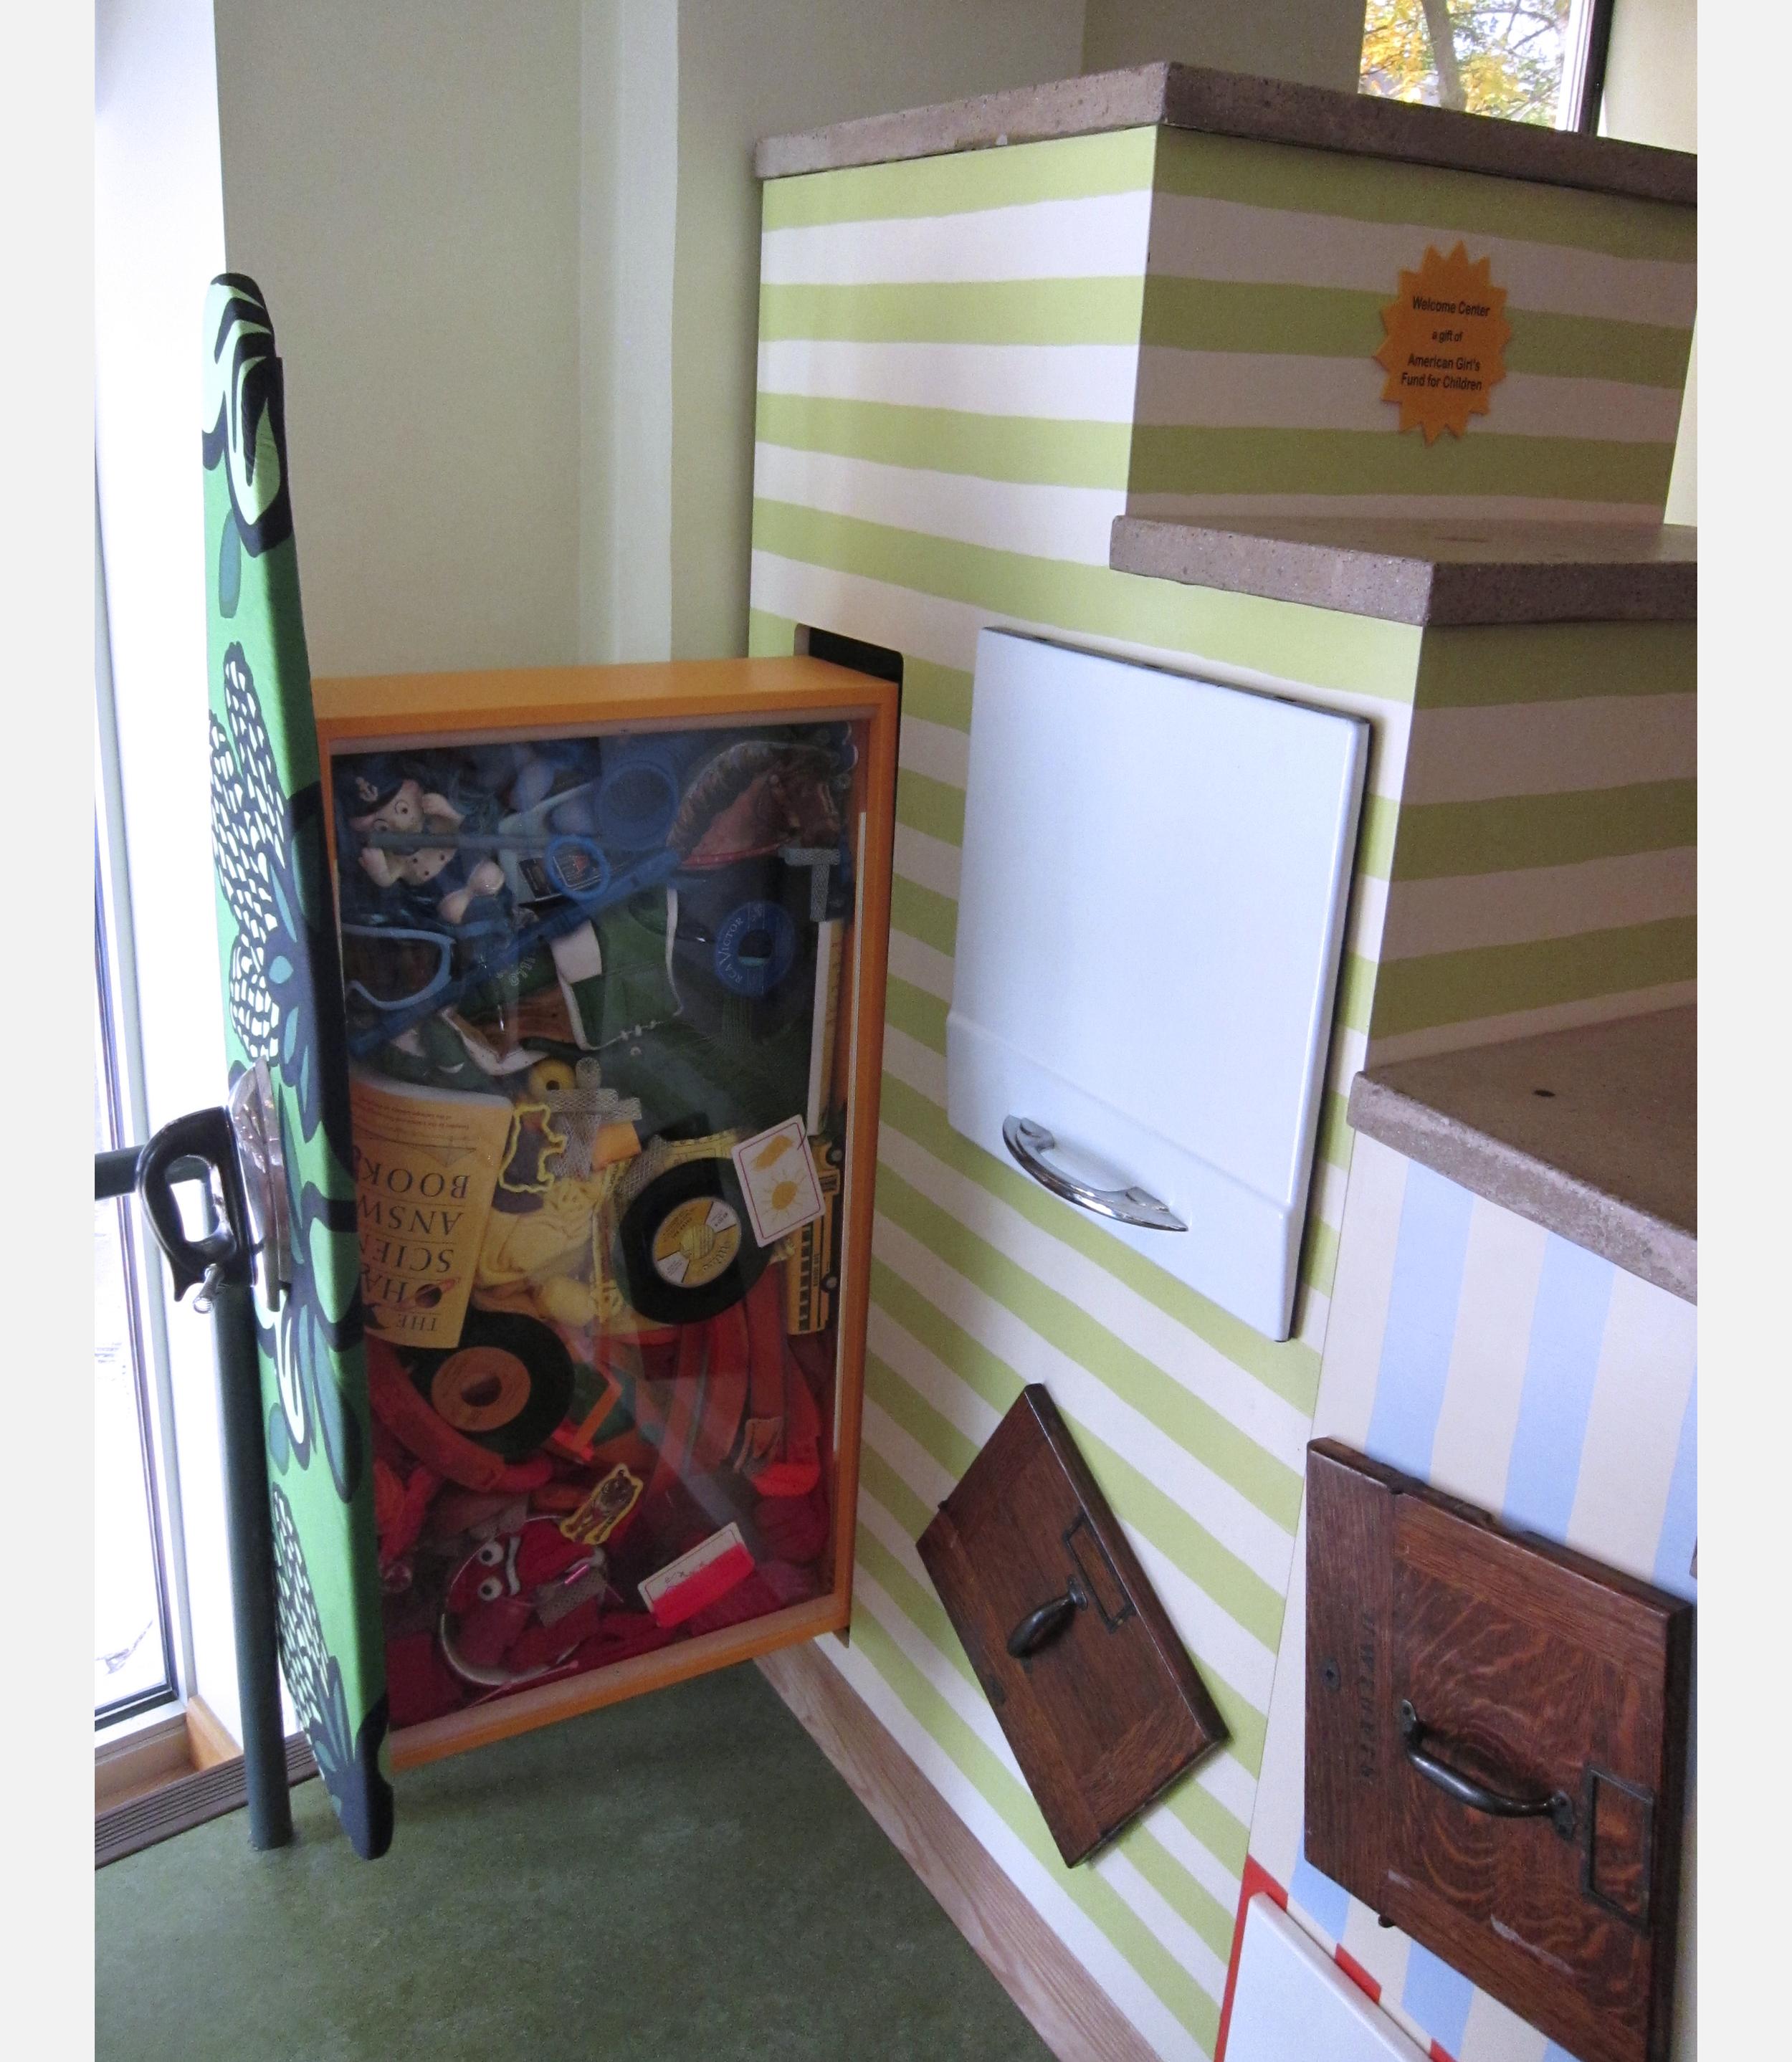 Reception Desk | Tom Loeser and Bird Ross | Madison Children's Museum | 2010